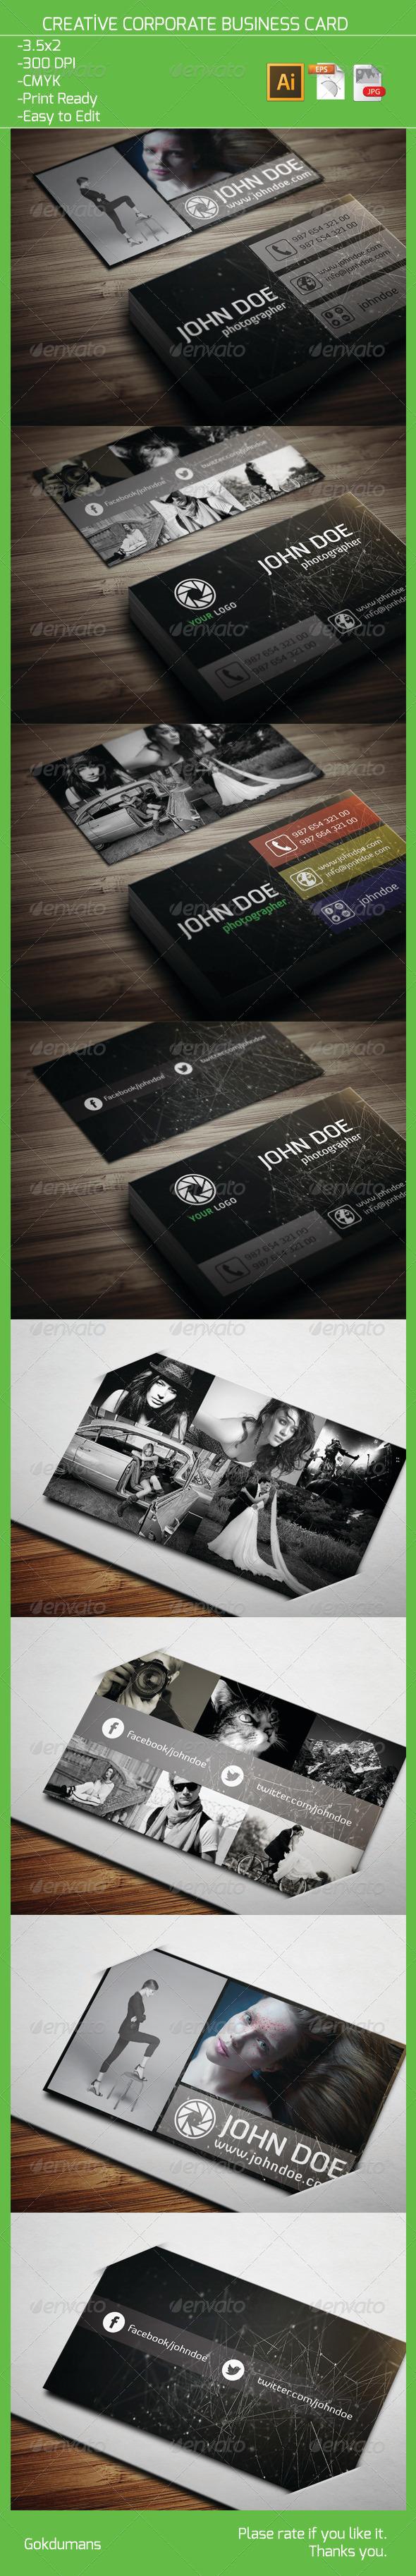 Creative Corporate Business Card 12 - Creative Business Cards